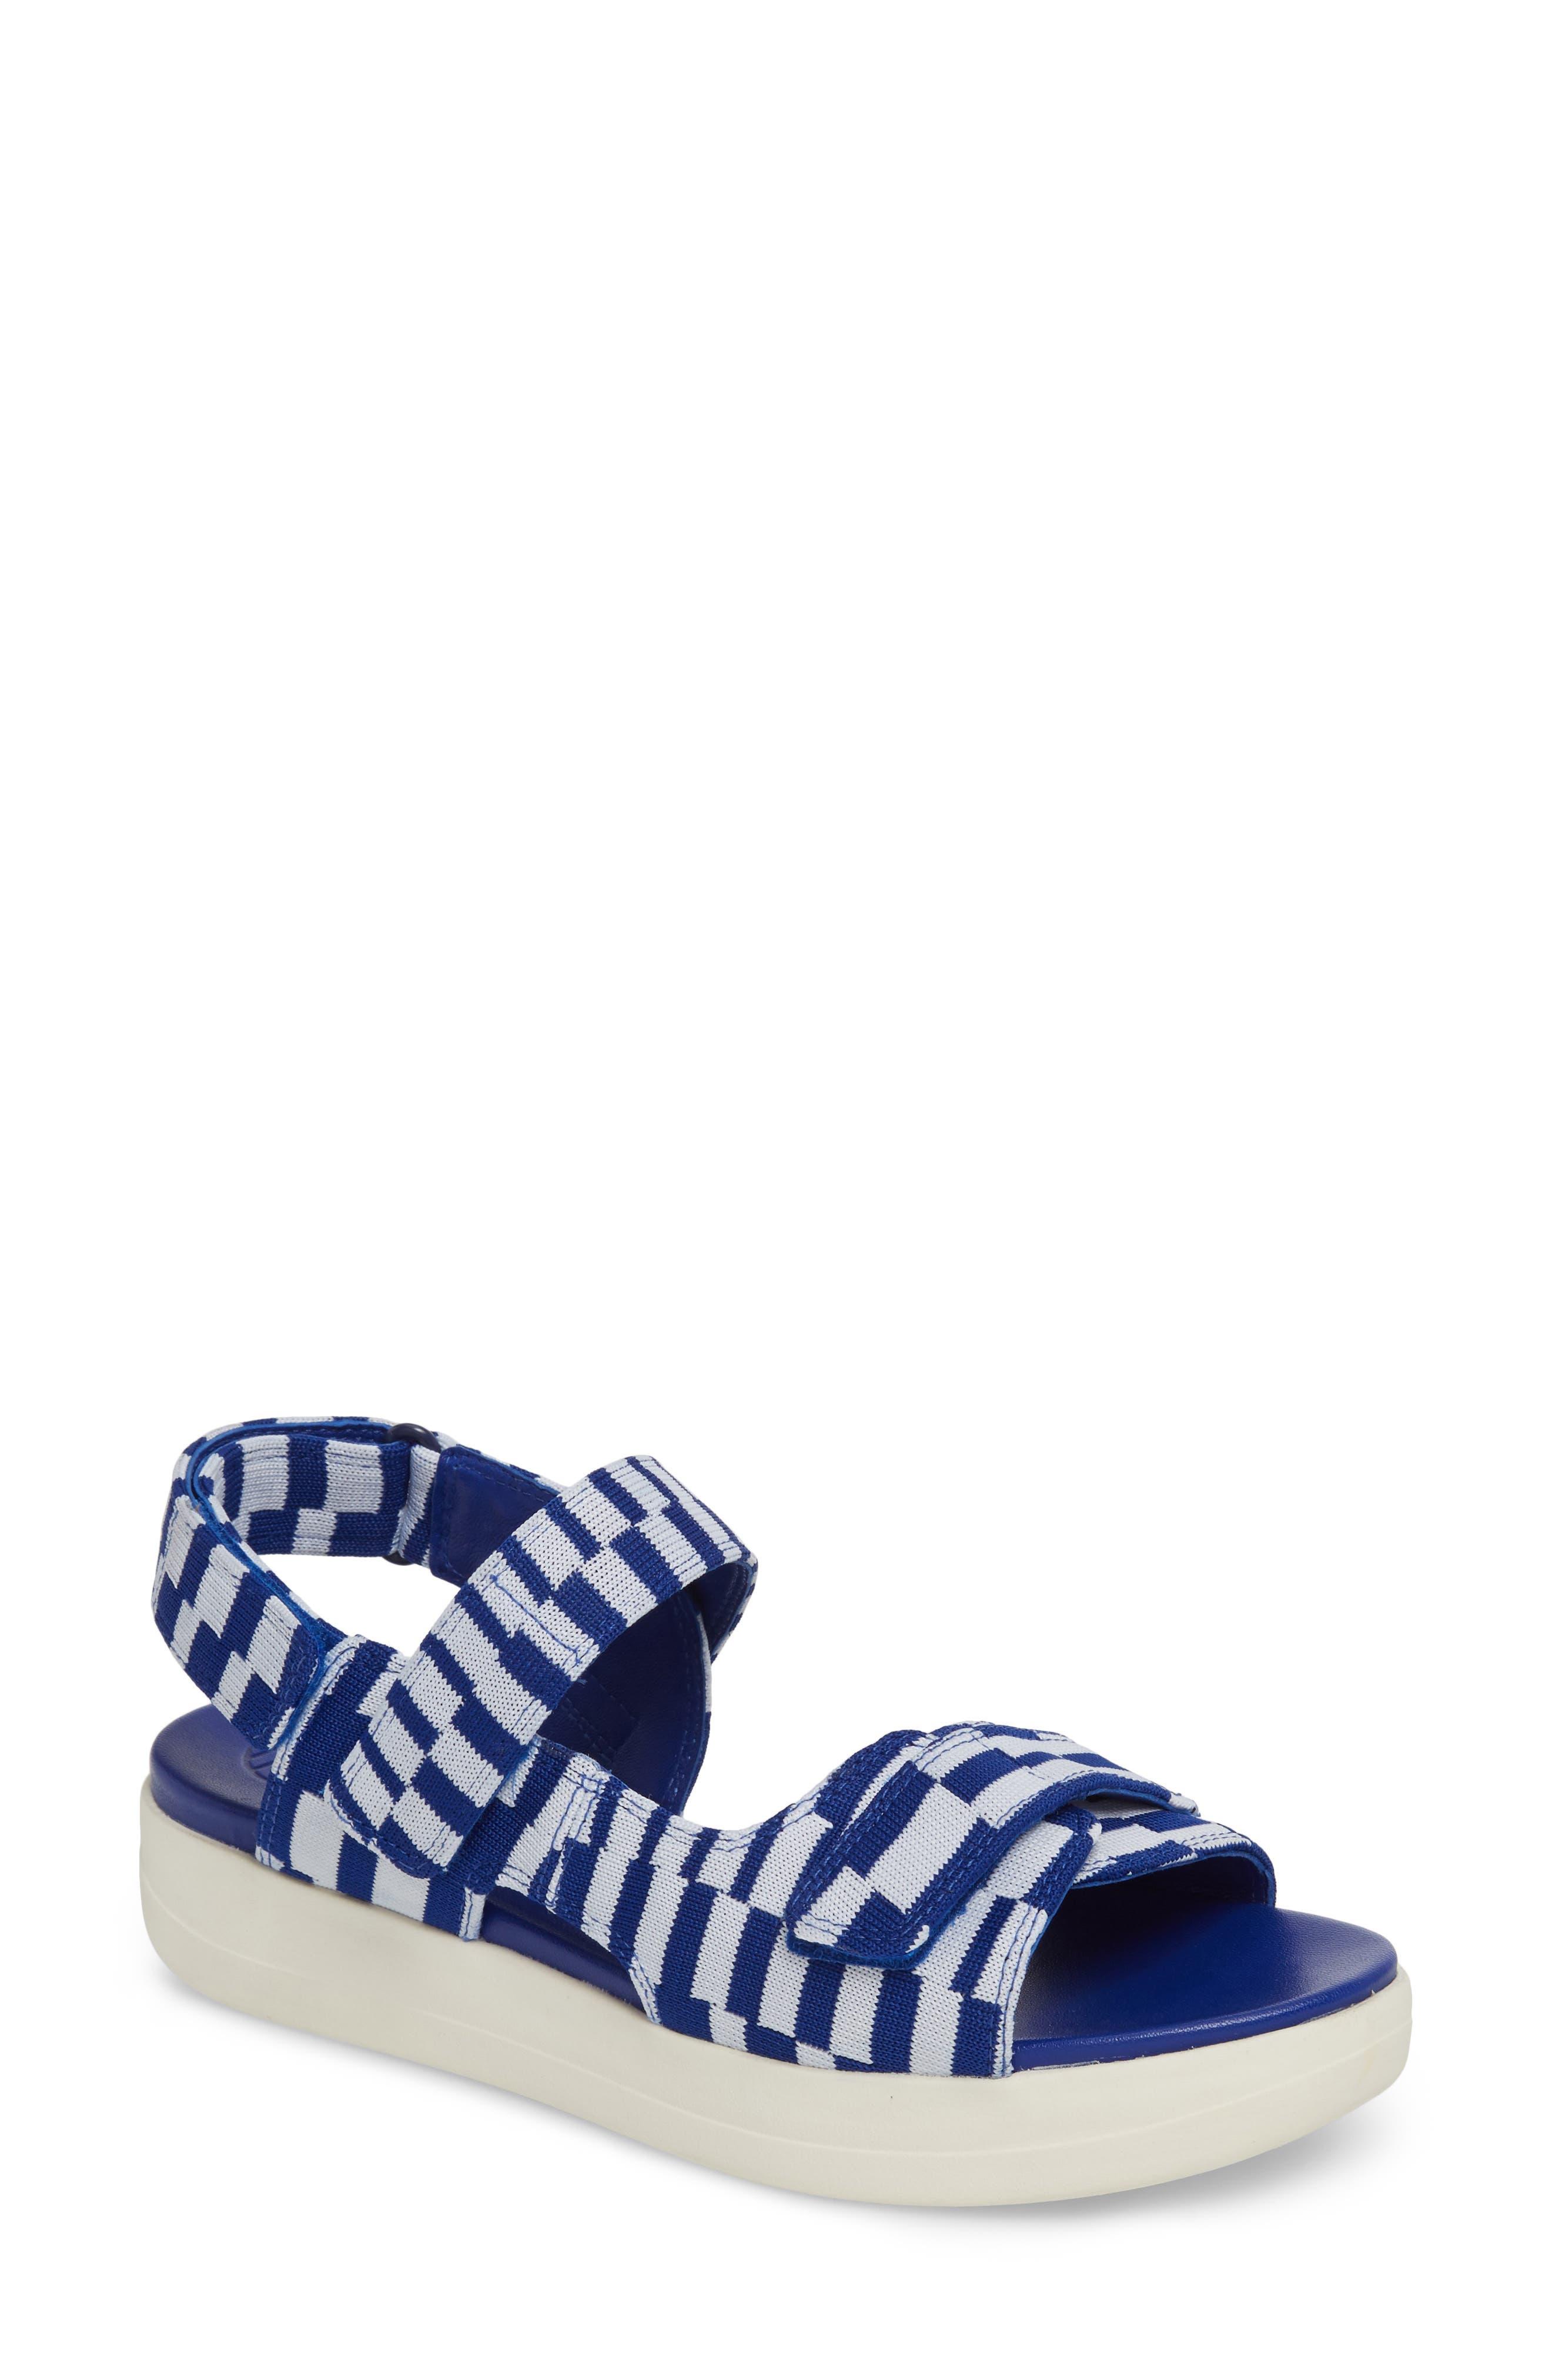 Flatform Sandal,                             Main thumbnail 1, color,                             Check Slalom Blue